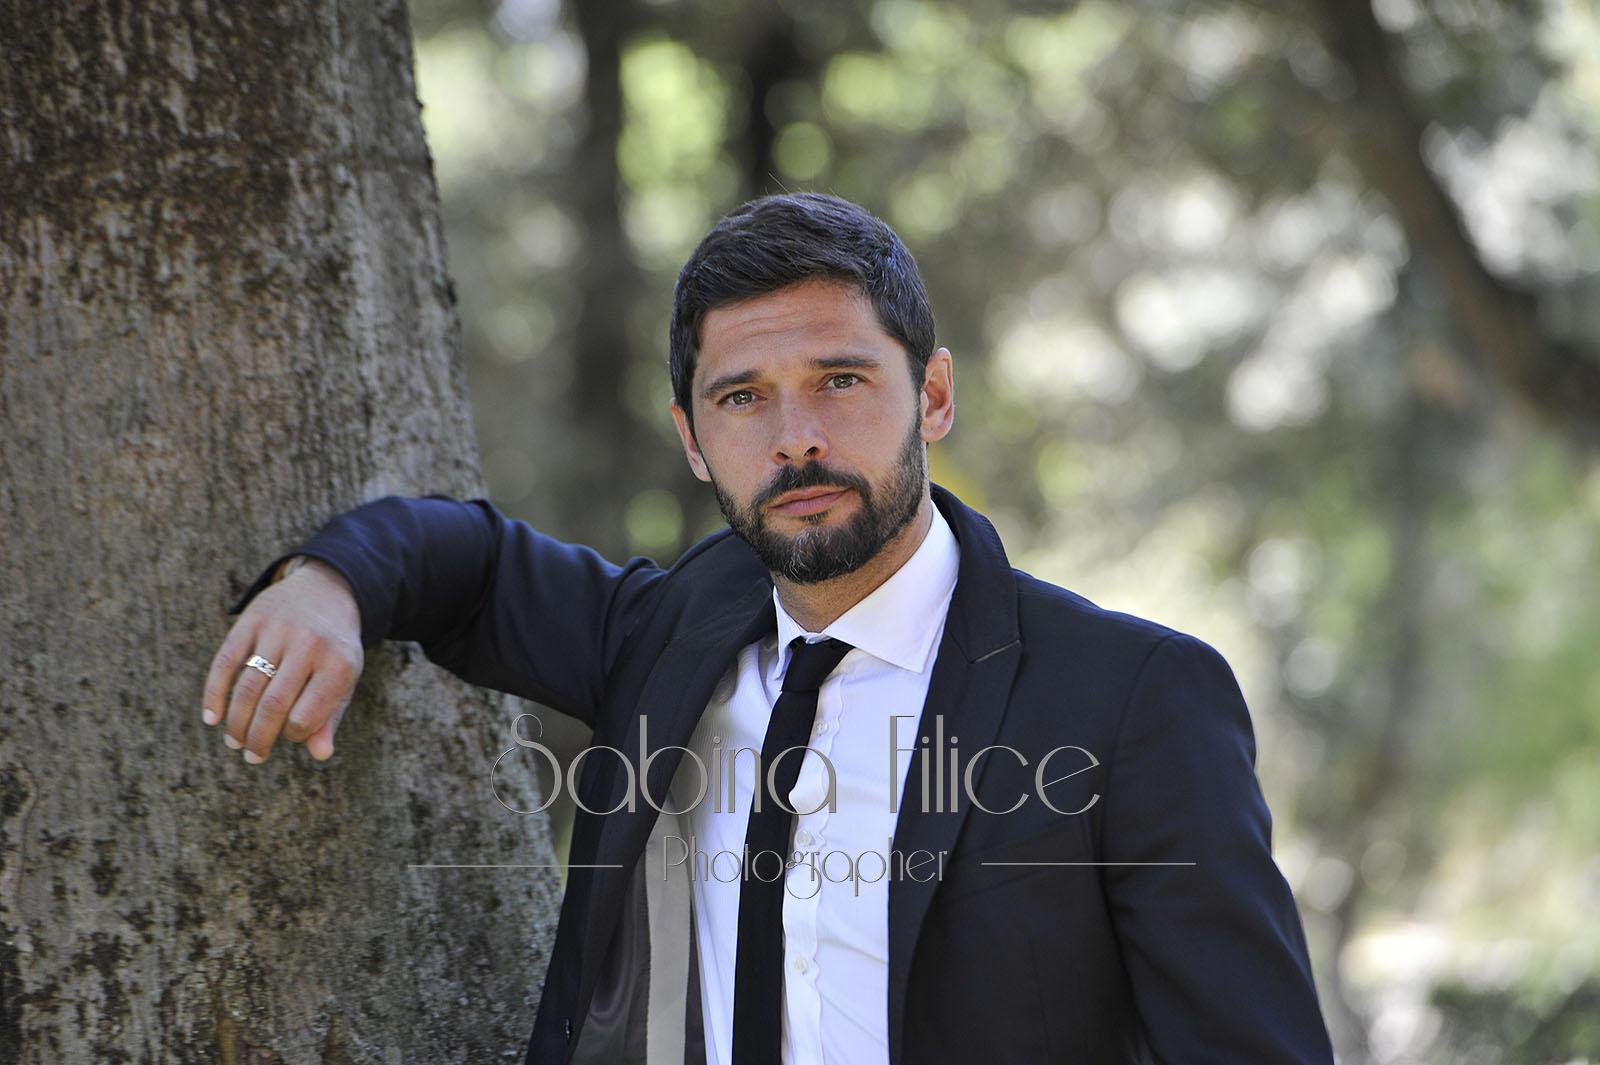 Luca Seta